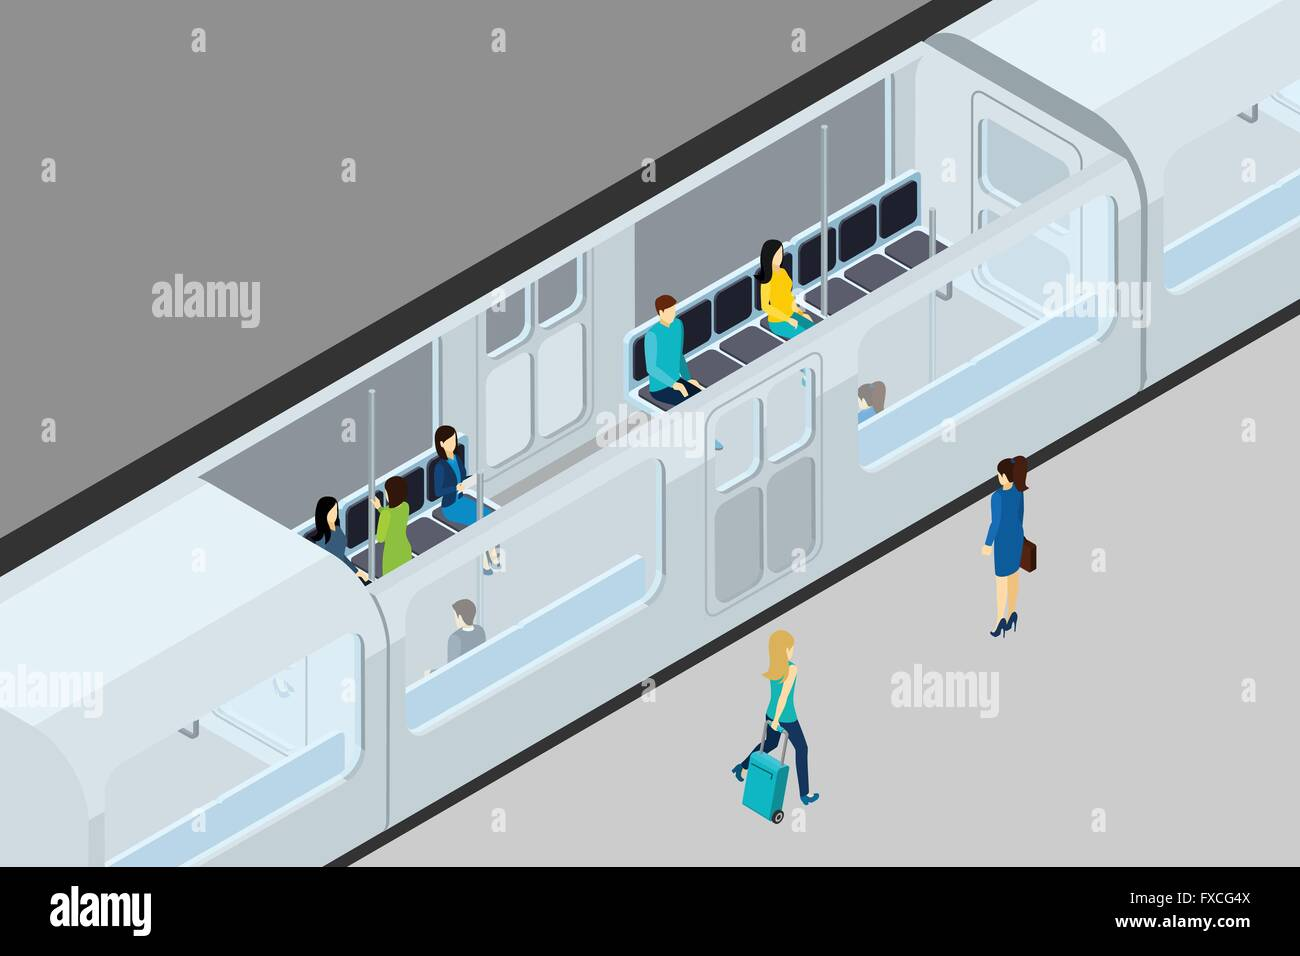 Underground People And Train Illustration - Stock Image